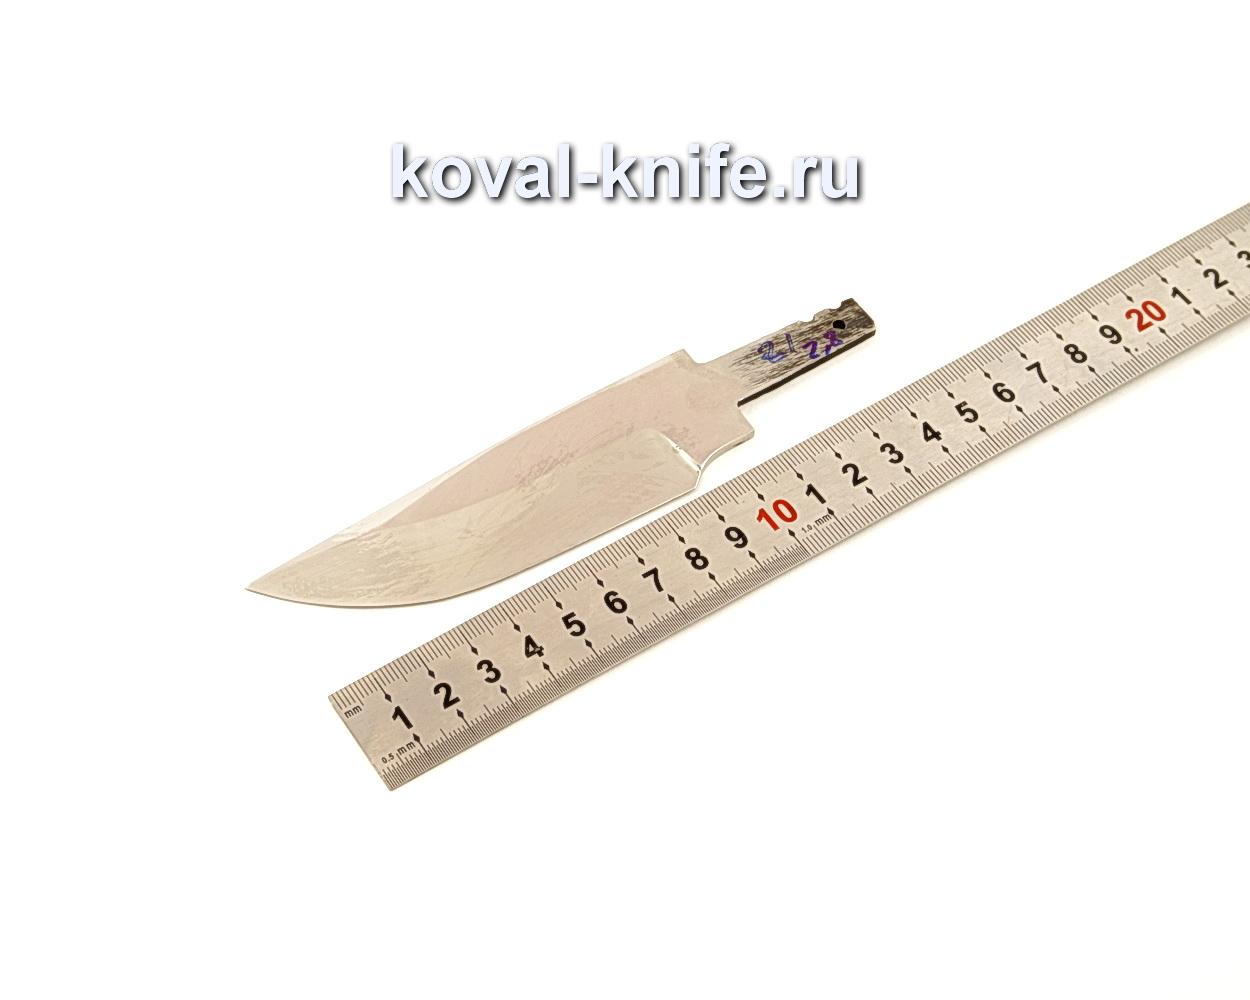 Клинок для ножа из кованой 95Х18 N81